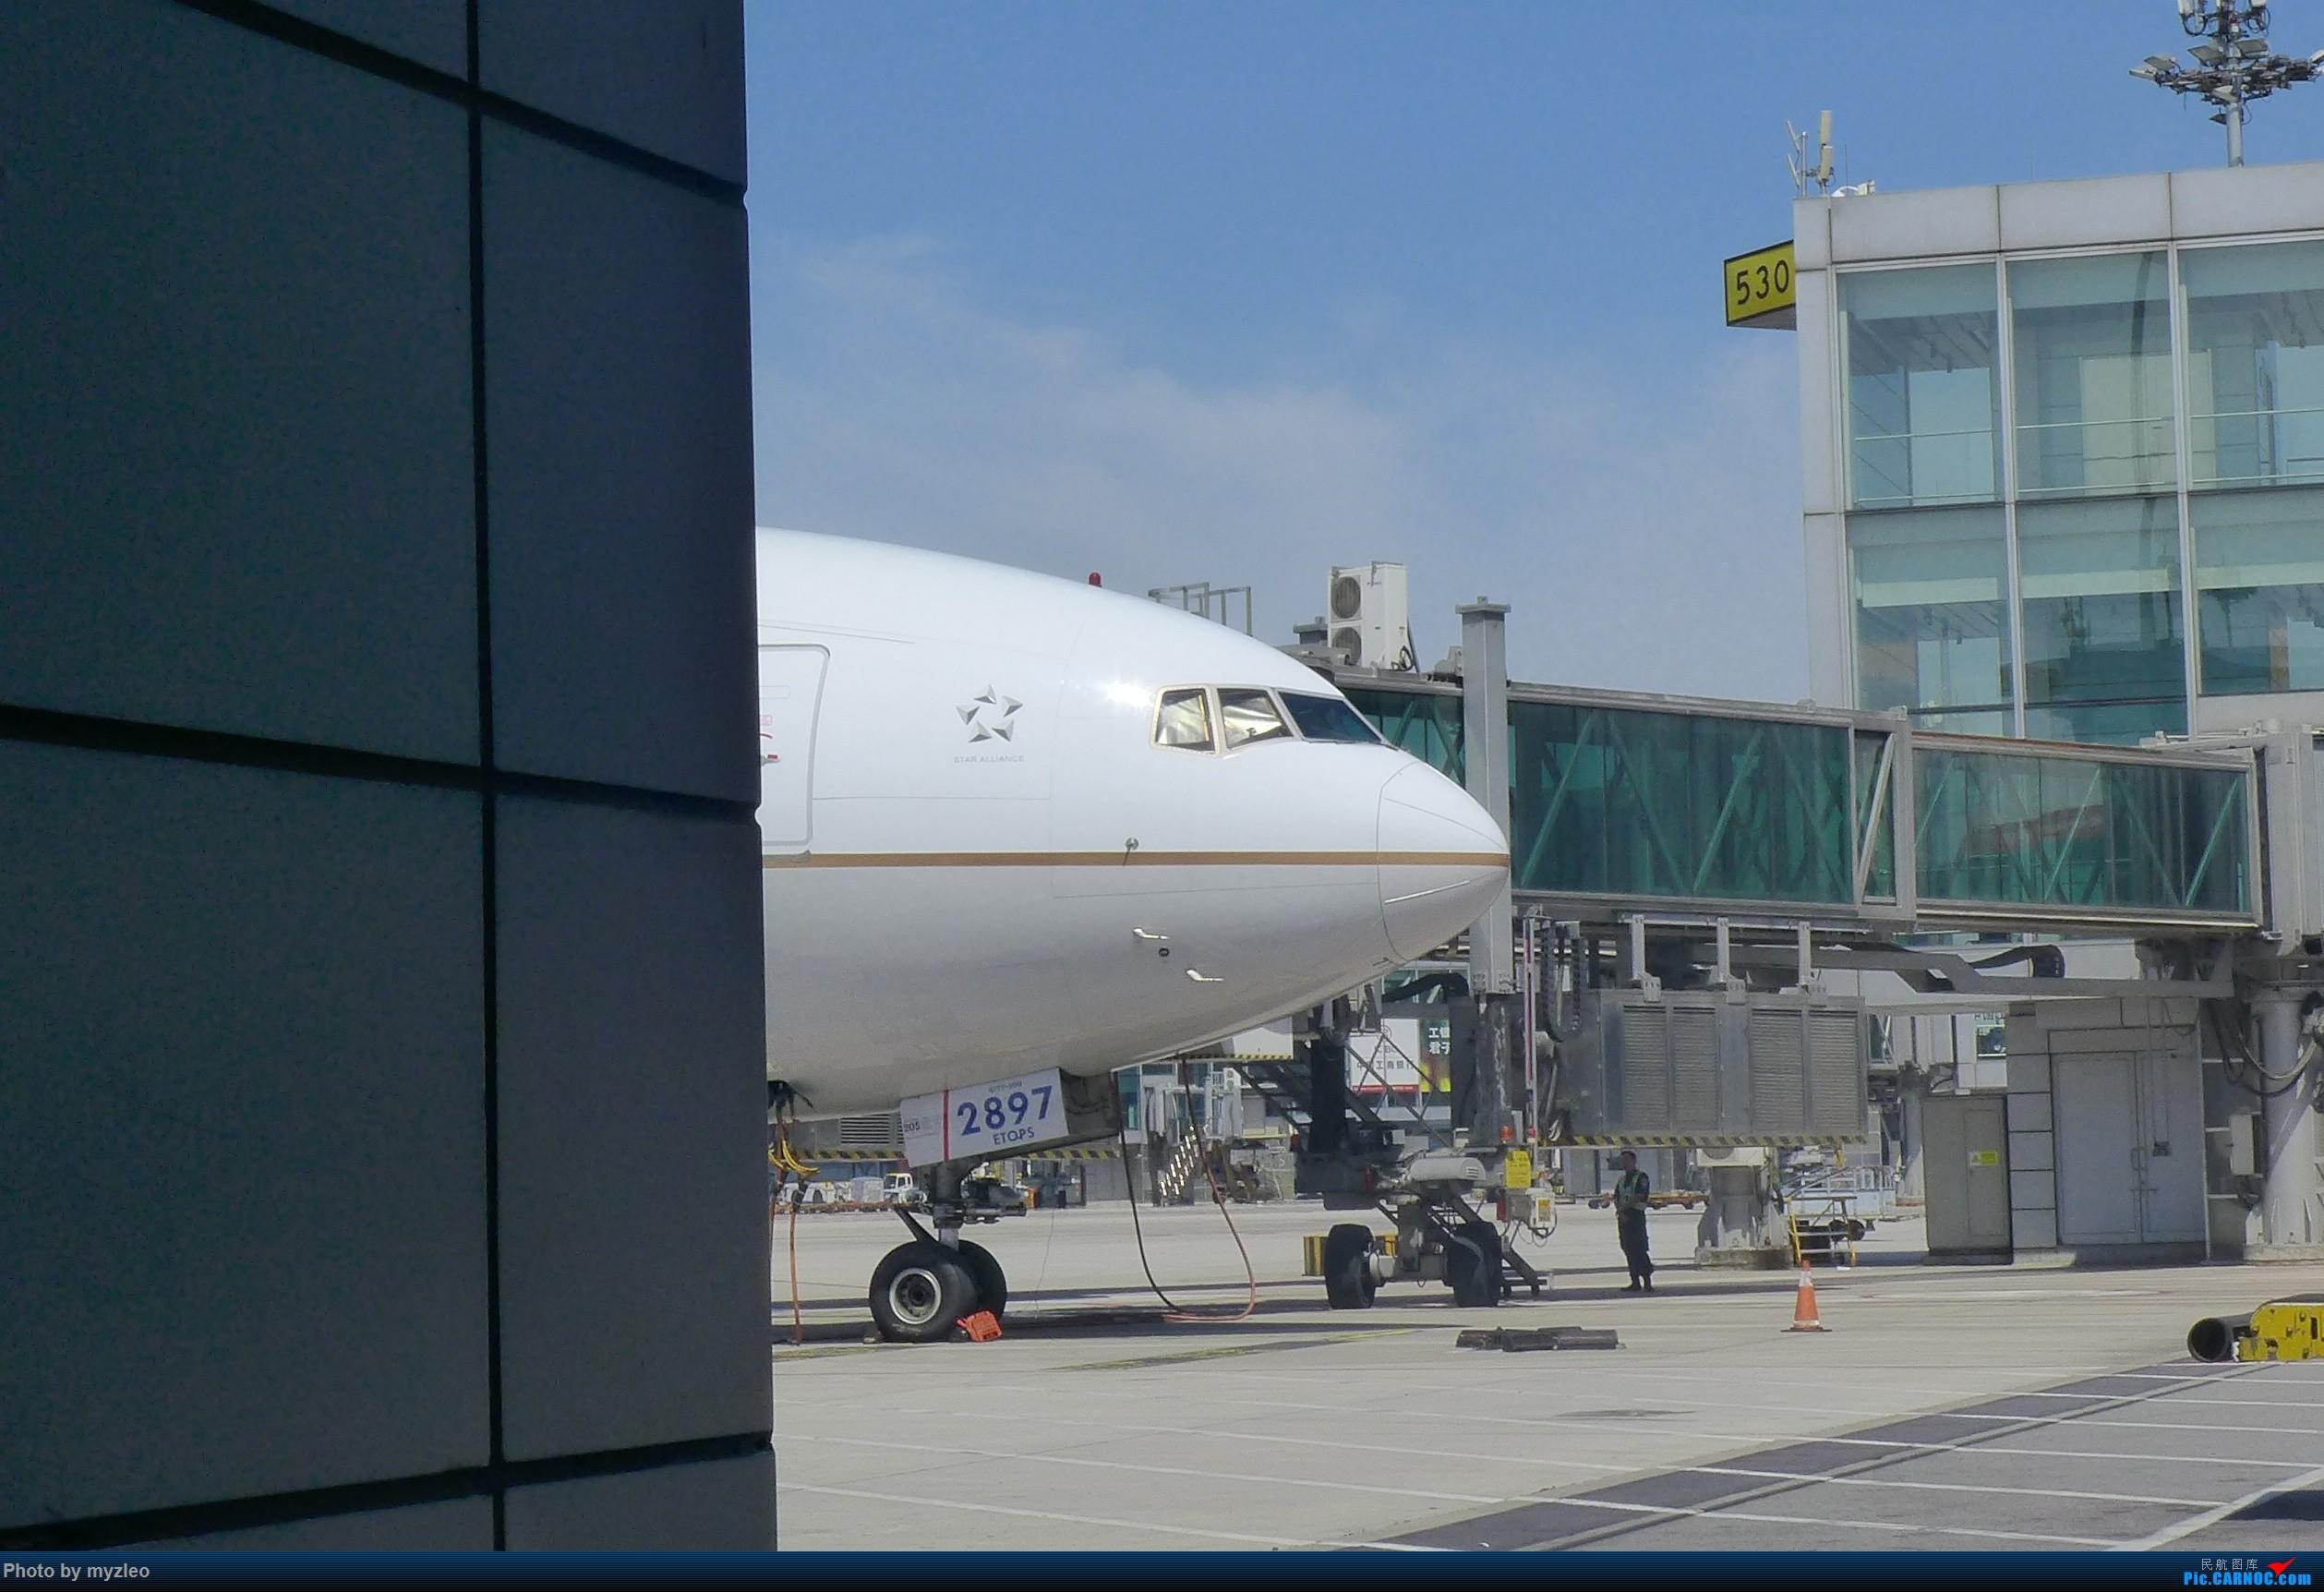 Re:[原创]【myzleo的游记3.1】三访帝都——记一次意外的惊喜,大鹅头初遇,第一次去中关村 BOEING 777-200ER N797UA 中国北京首都国际机场